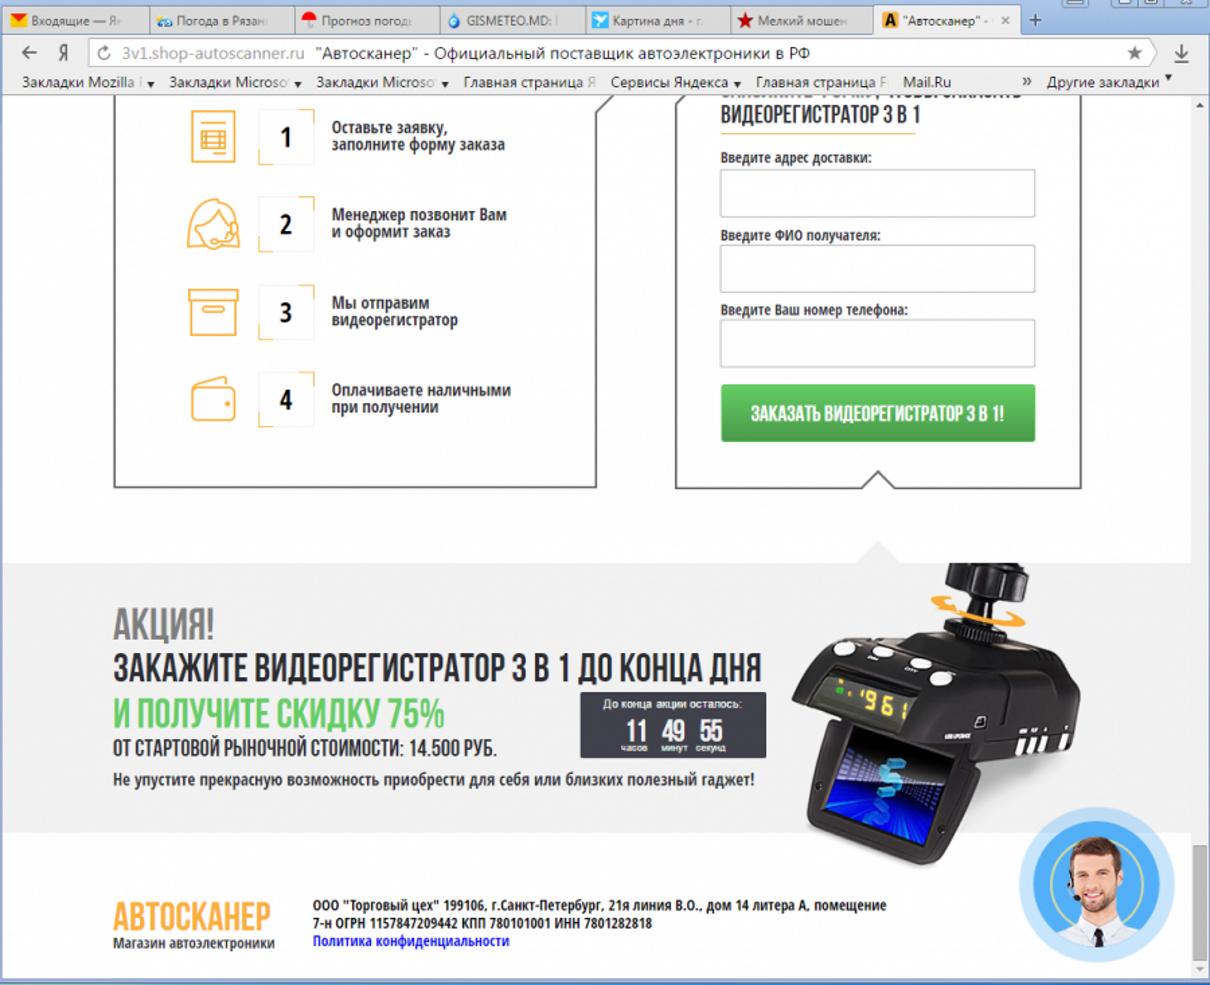 Жалоба-отзыв: Eurotima24@mail.ru - Этот интернет магазин - лохотрон.  Фото №2